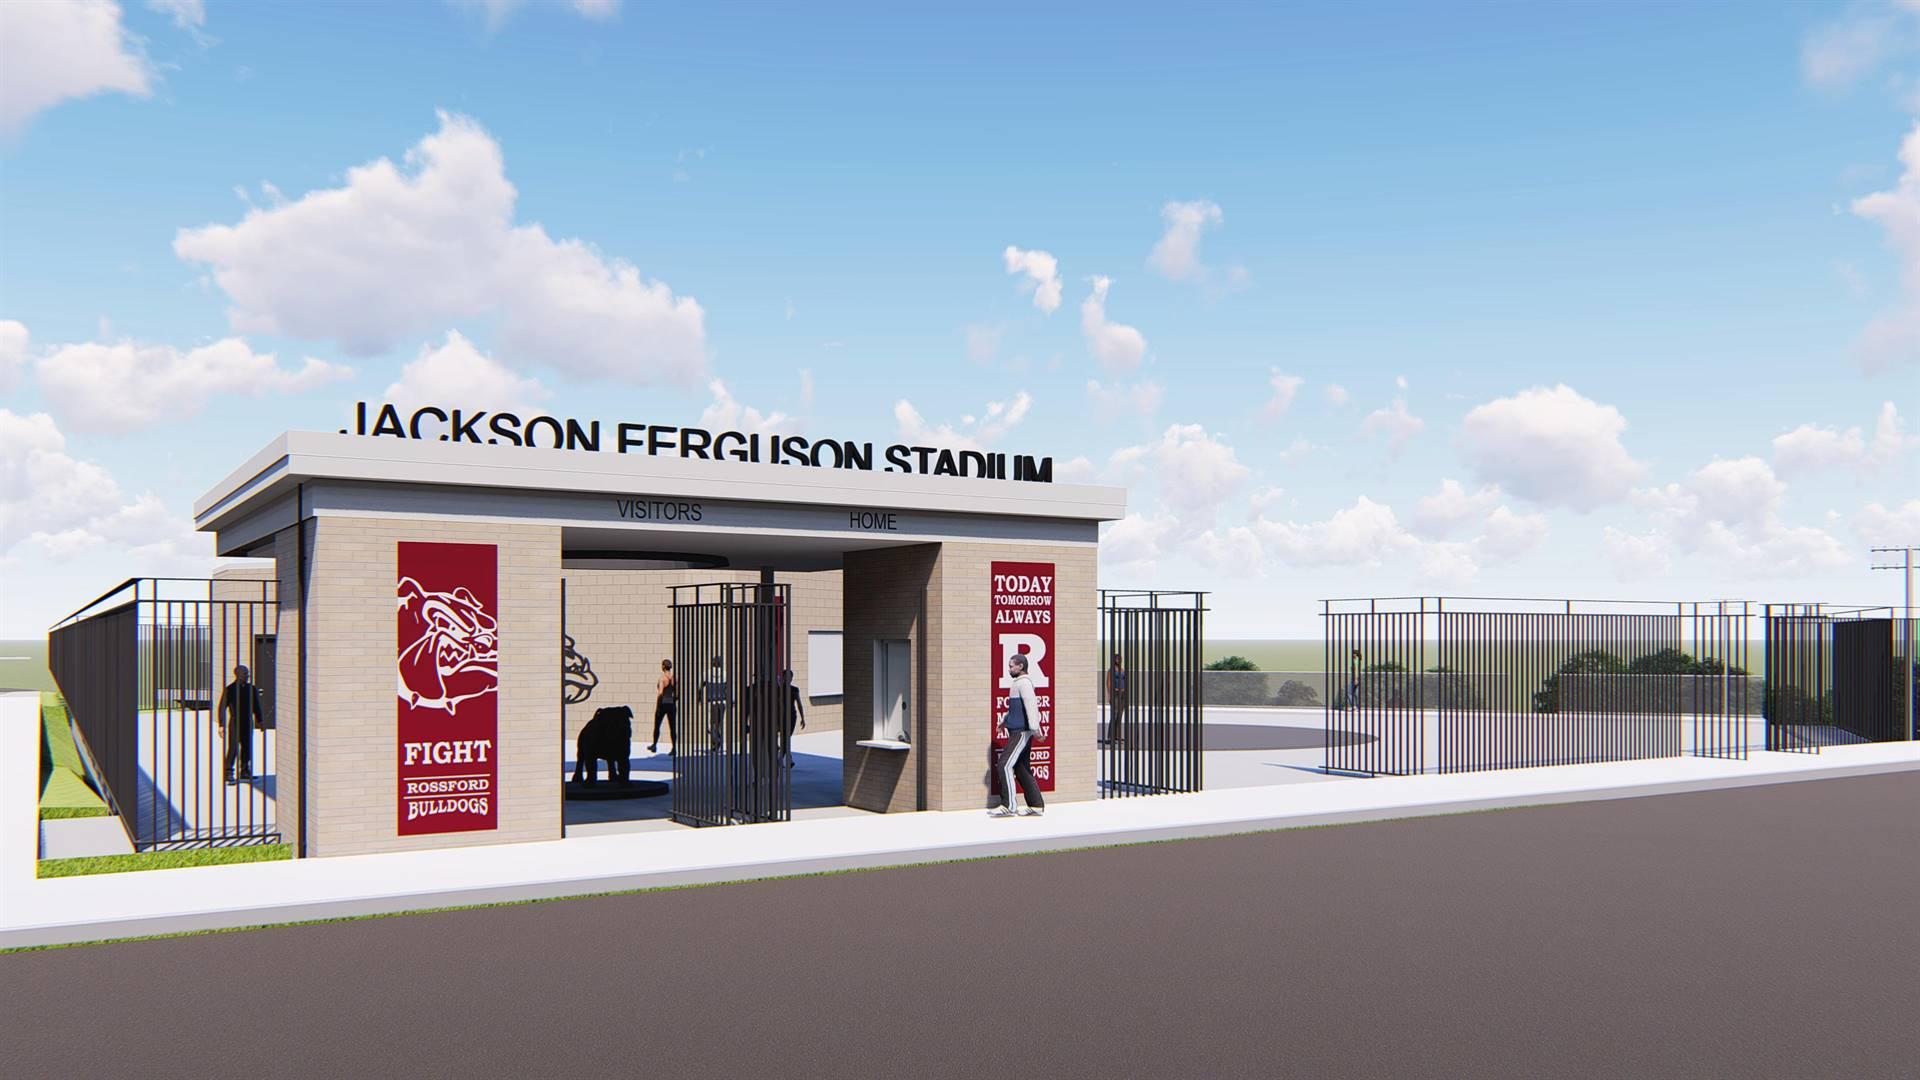 Entrance to Jackson Ferguson Stadium